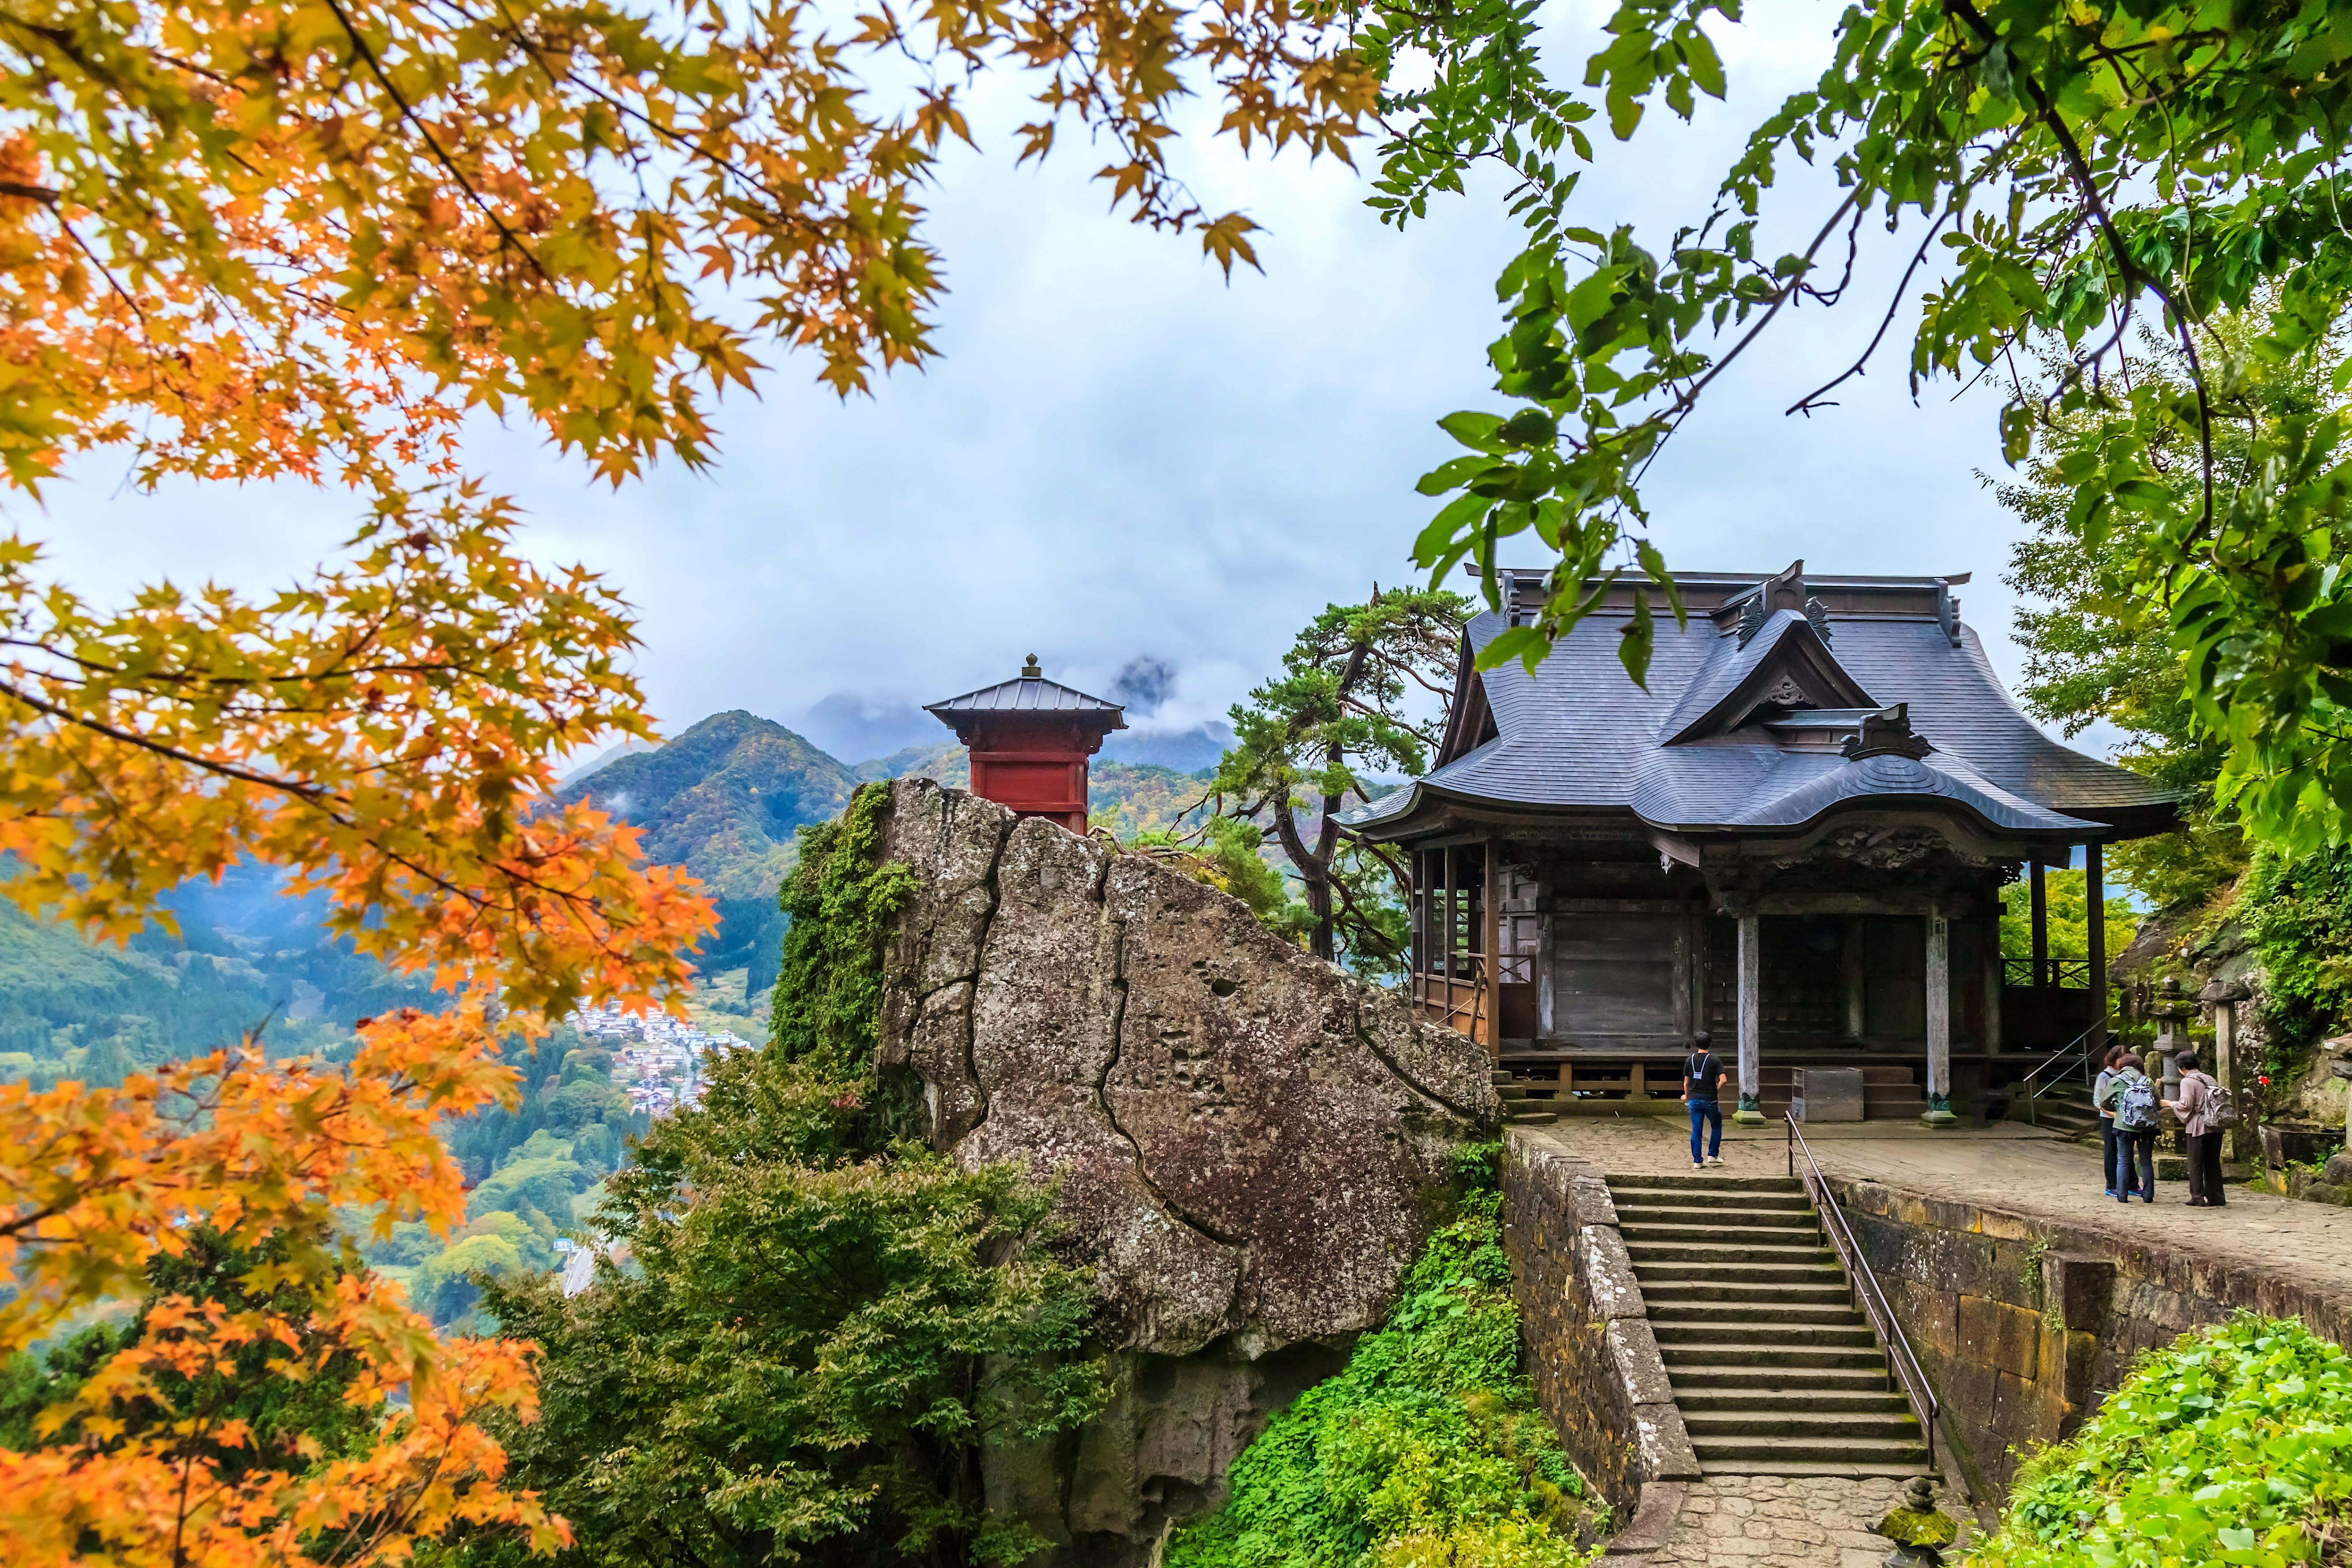 Exterior of Yamadera Temple during autumn